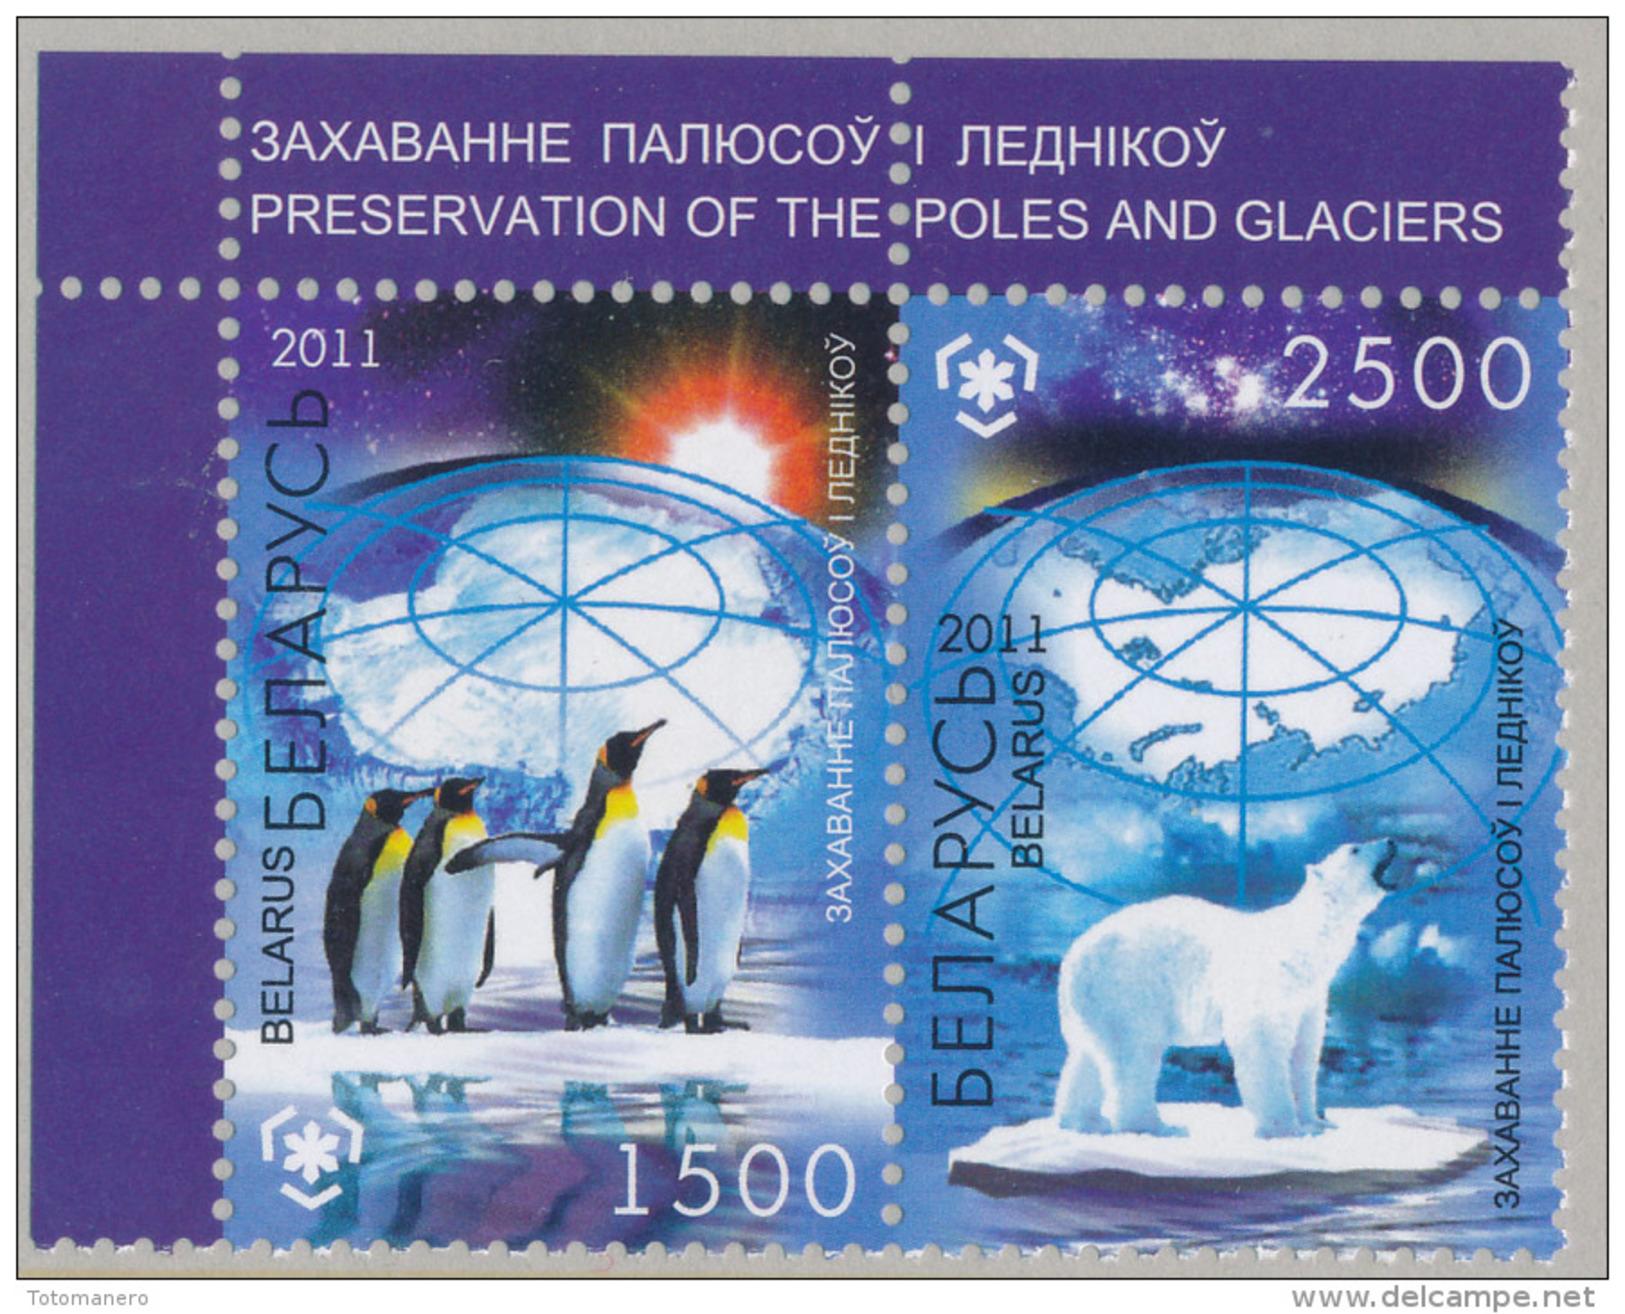 BELARUS/Weißrussland, IPY International Polar Year - Preserve The Polar Regions And Glaciers Pair** - Preservare Le Regioni Polari E Ghiacciai